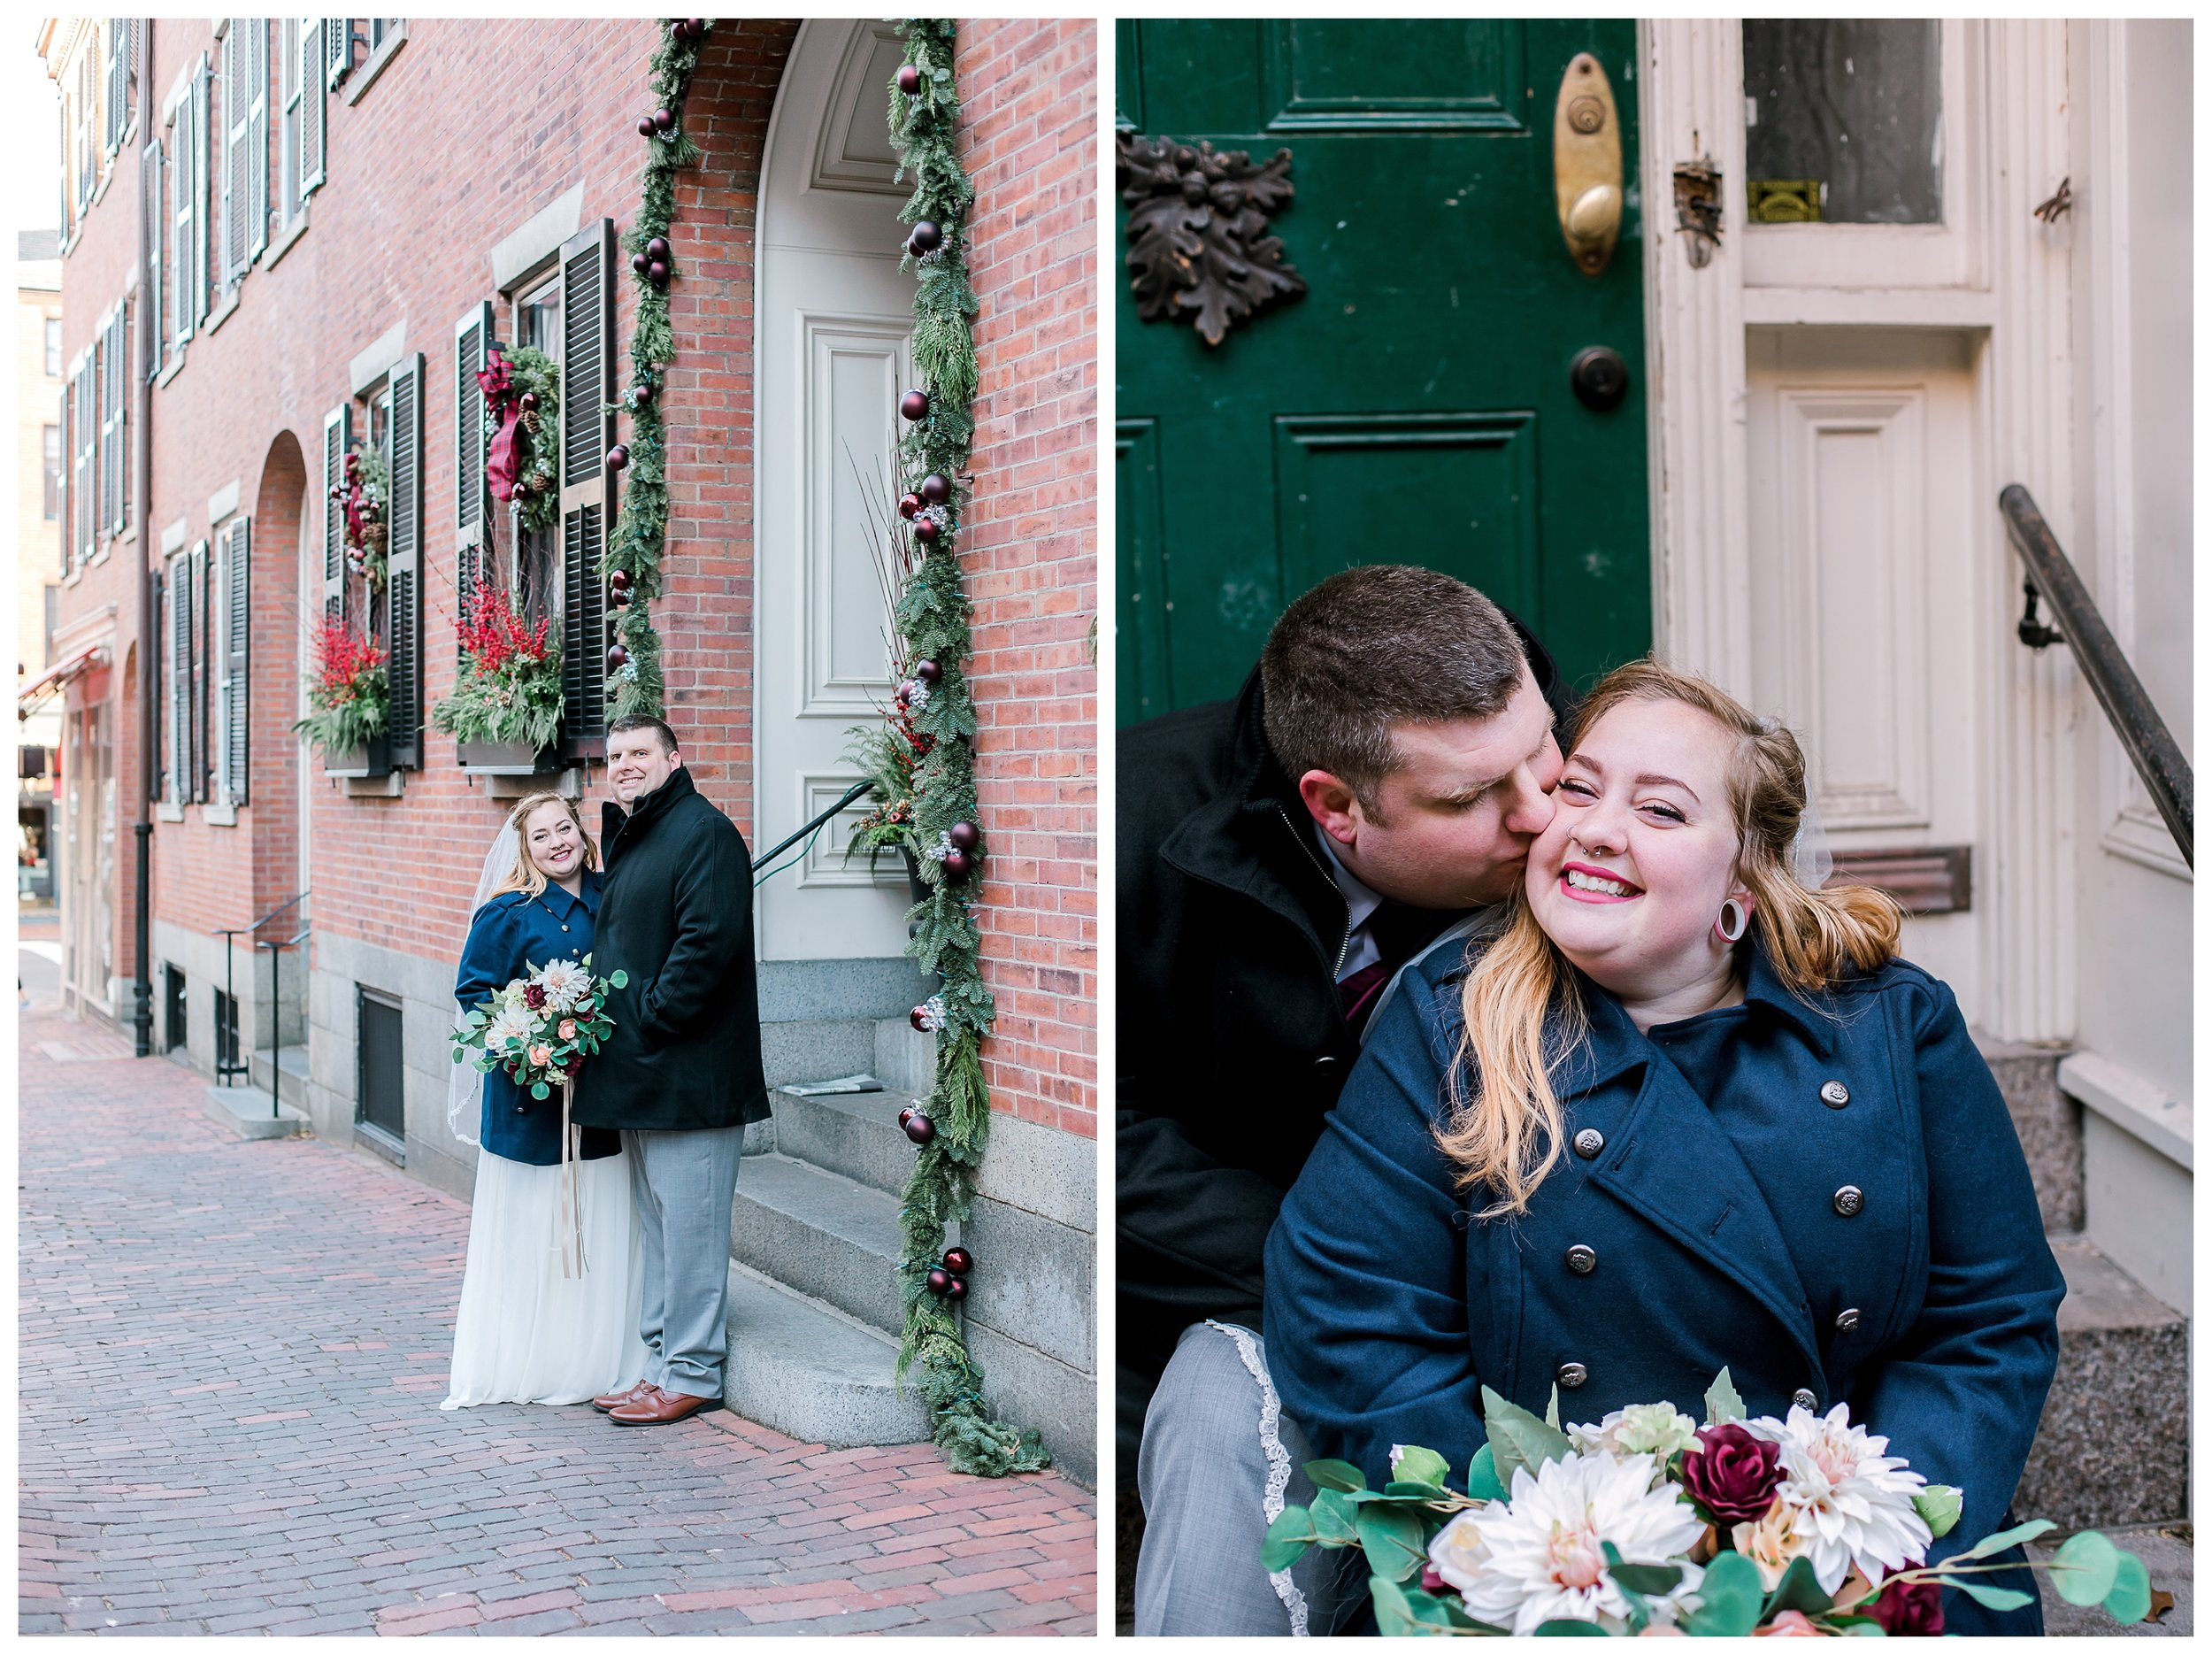 boston_acorn_street_elopement_photos_erica_pezente_photography (1).jpg